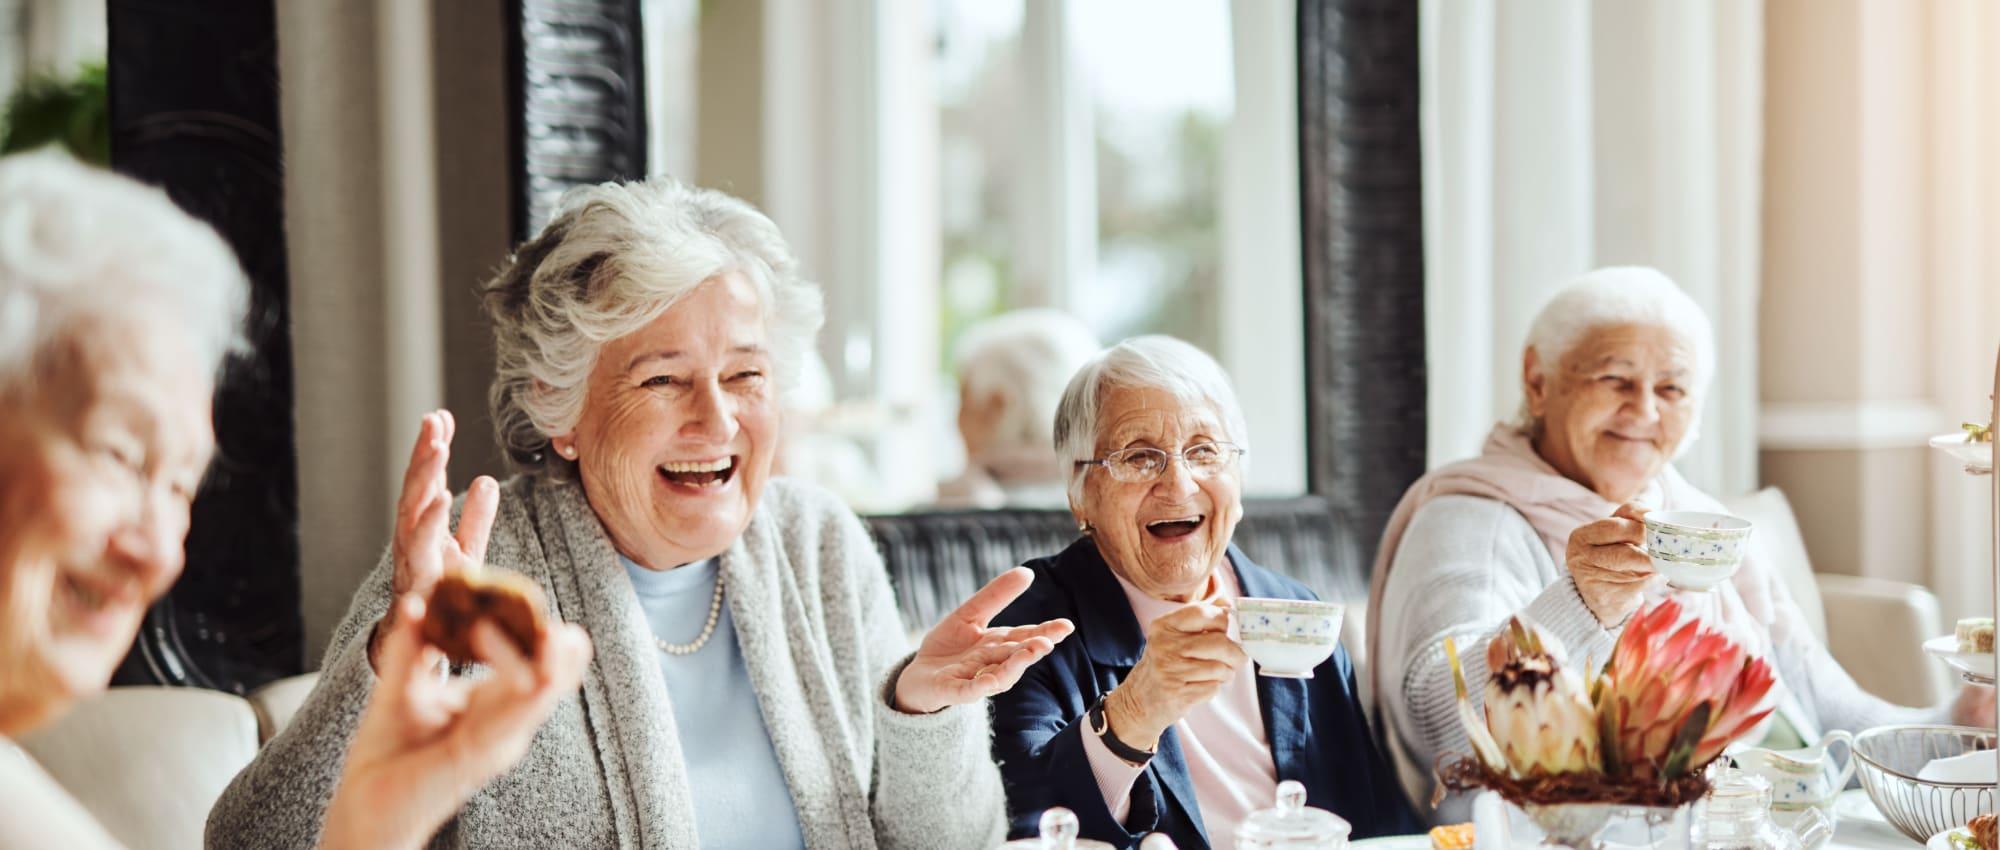 Services and amenities at Milestone Senior Living Rhinelander in Rhinelander, Wisconsin.